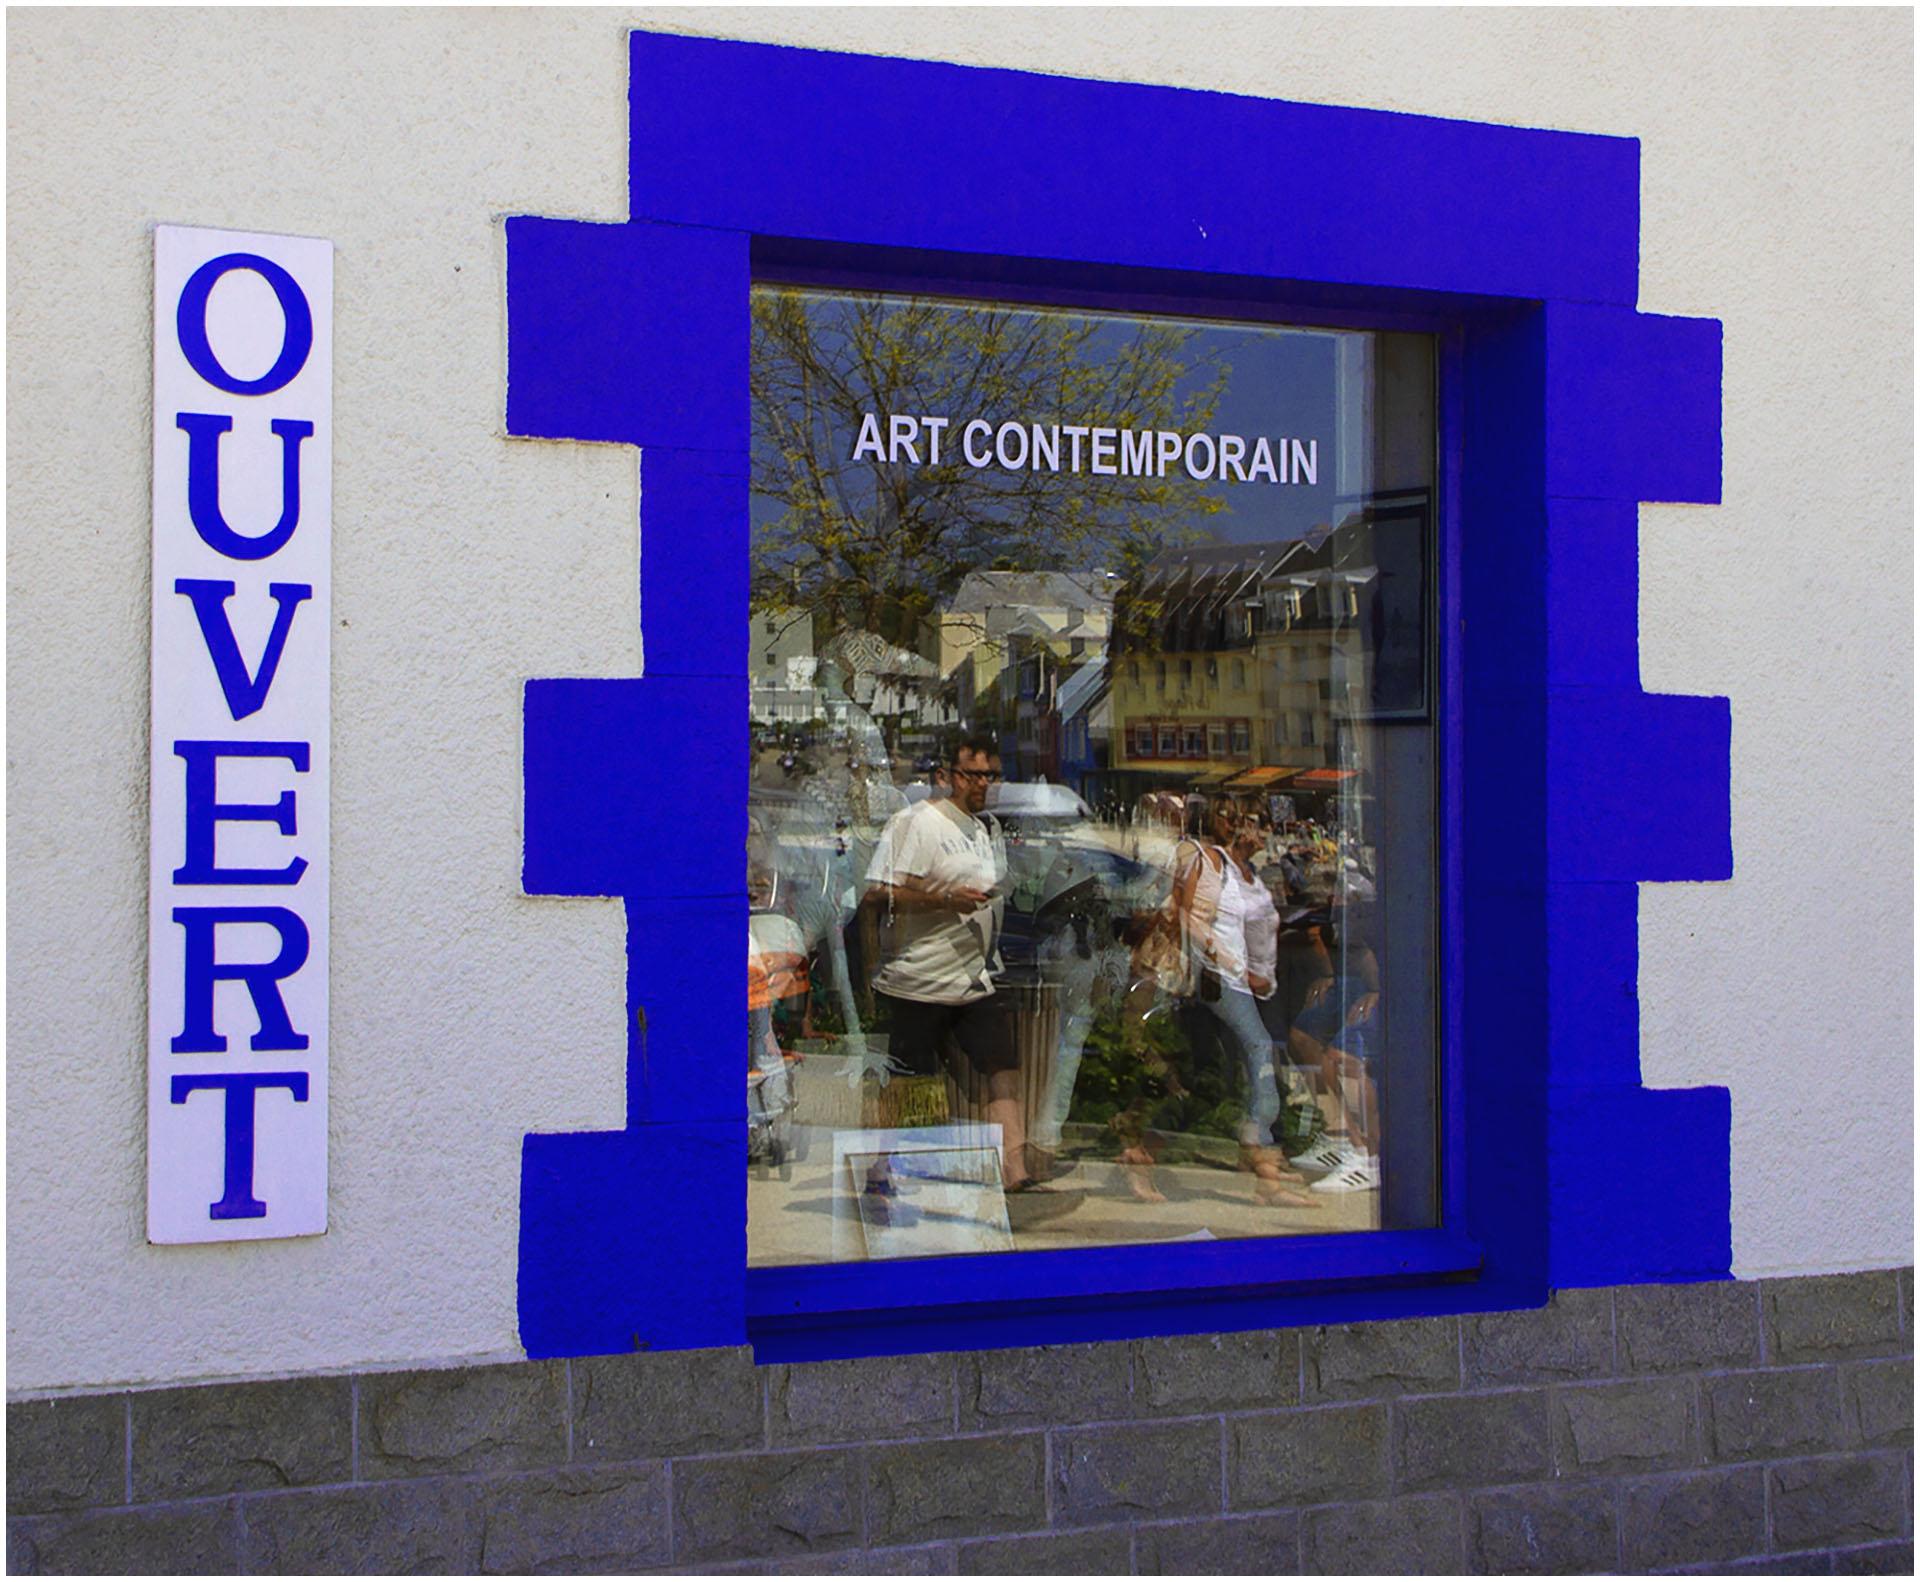 12-Art contemporain